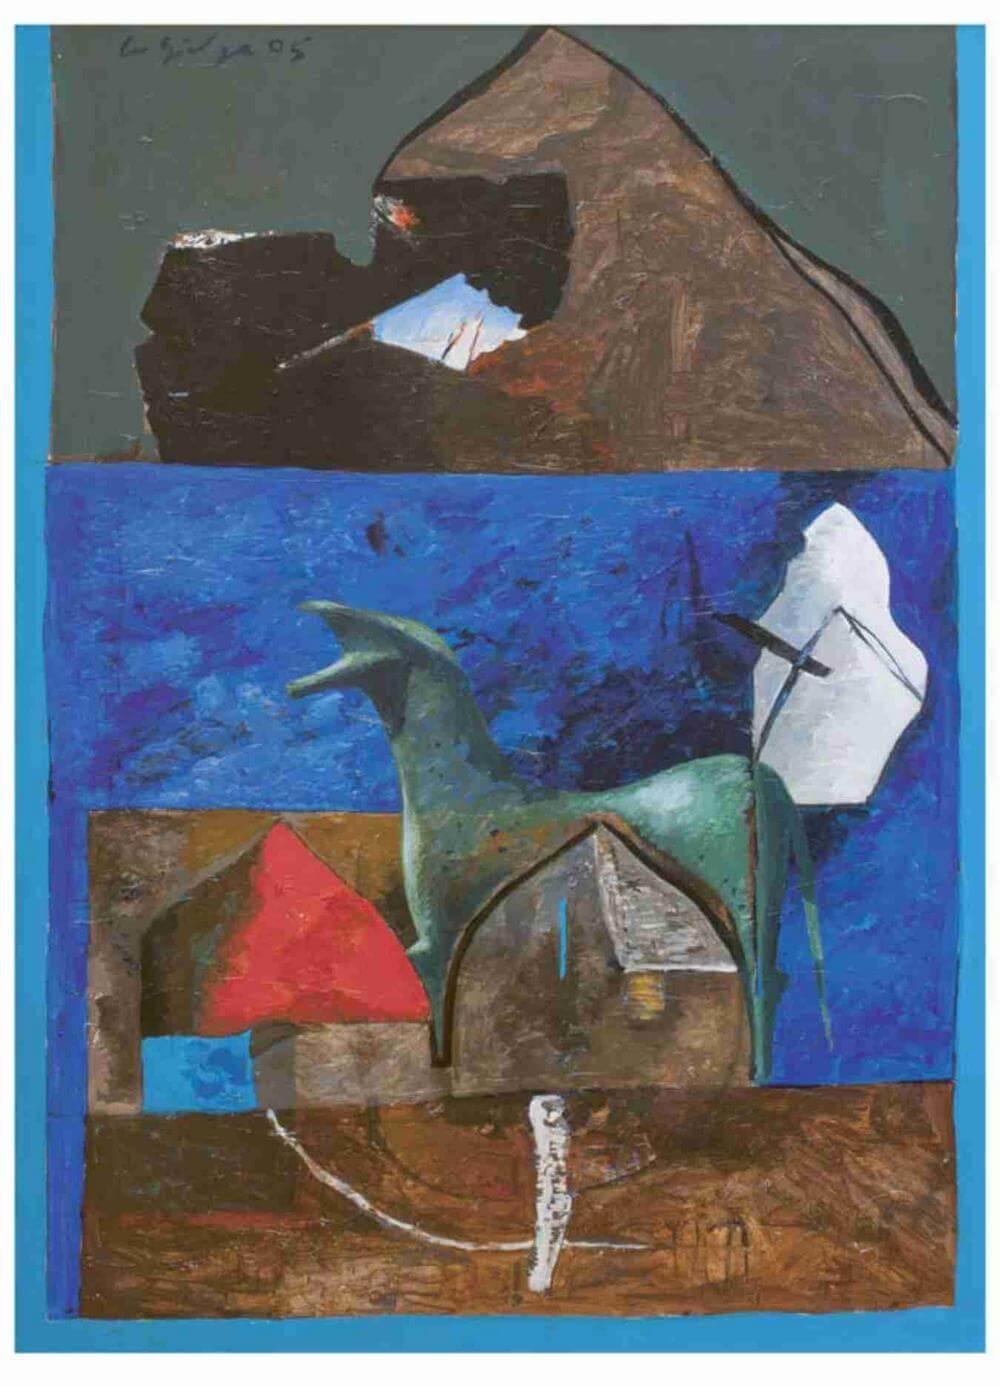 JOHN CORBIDGE ΜΑΓΙΚΟ ΒΟΥΝΟ ΛΕΥΚΟ 1998